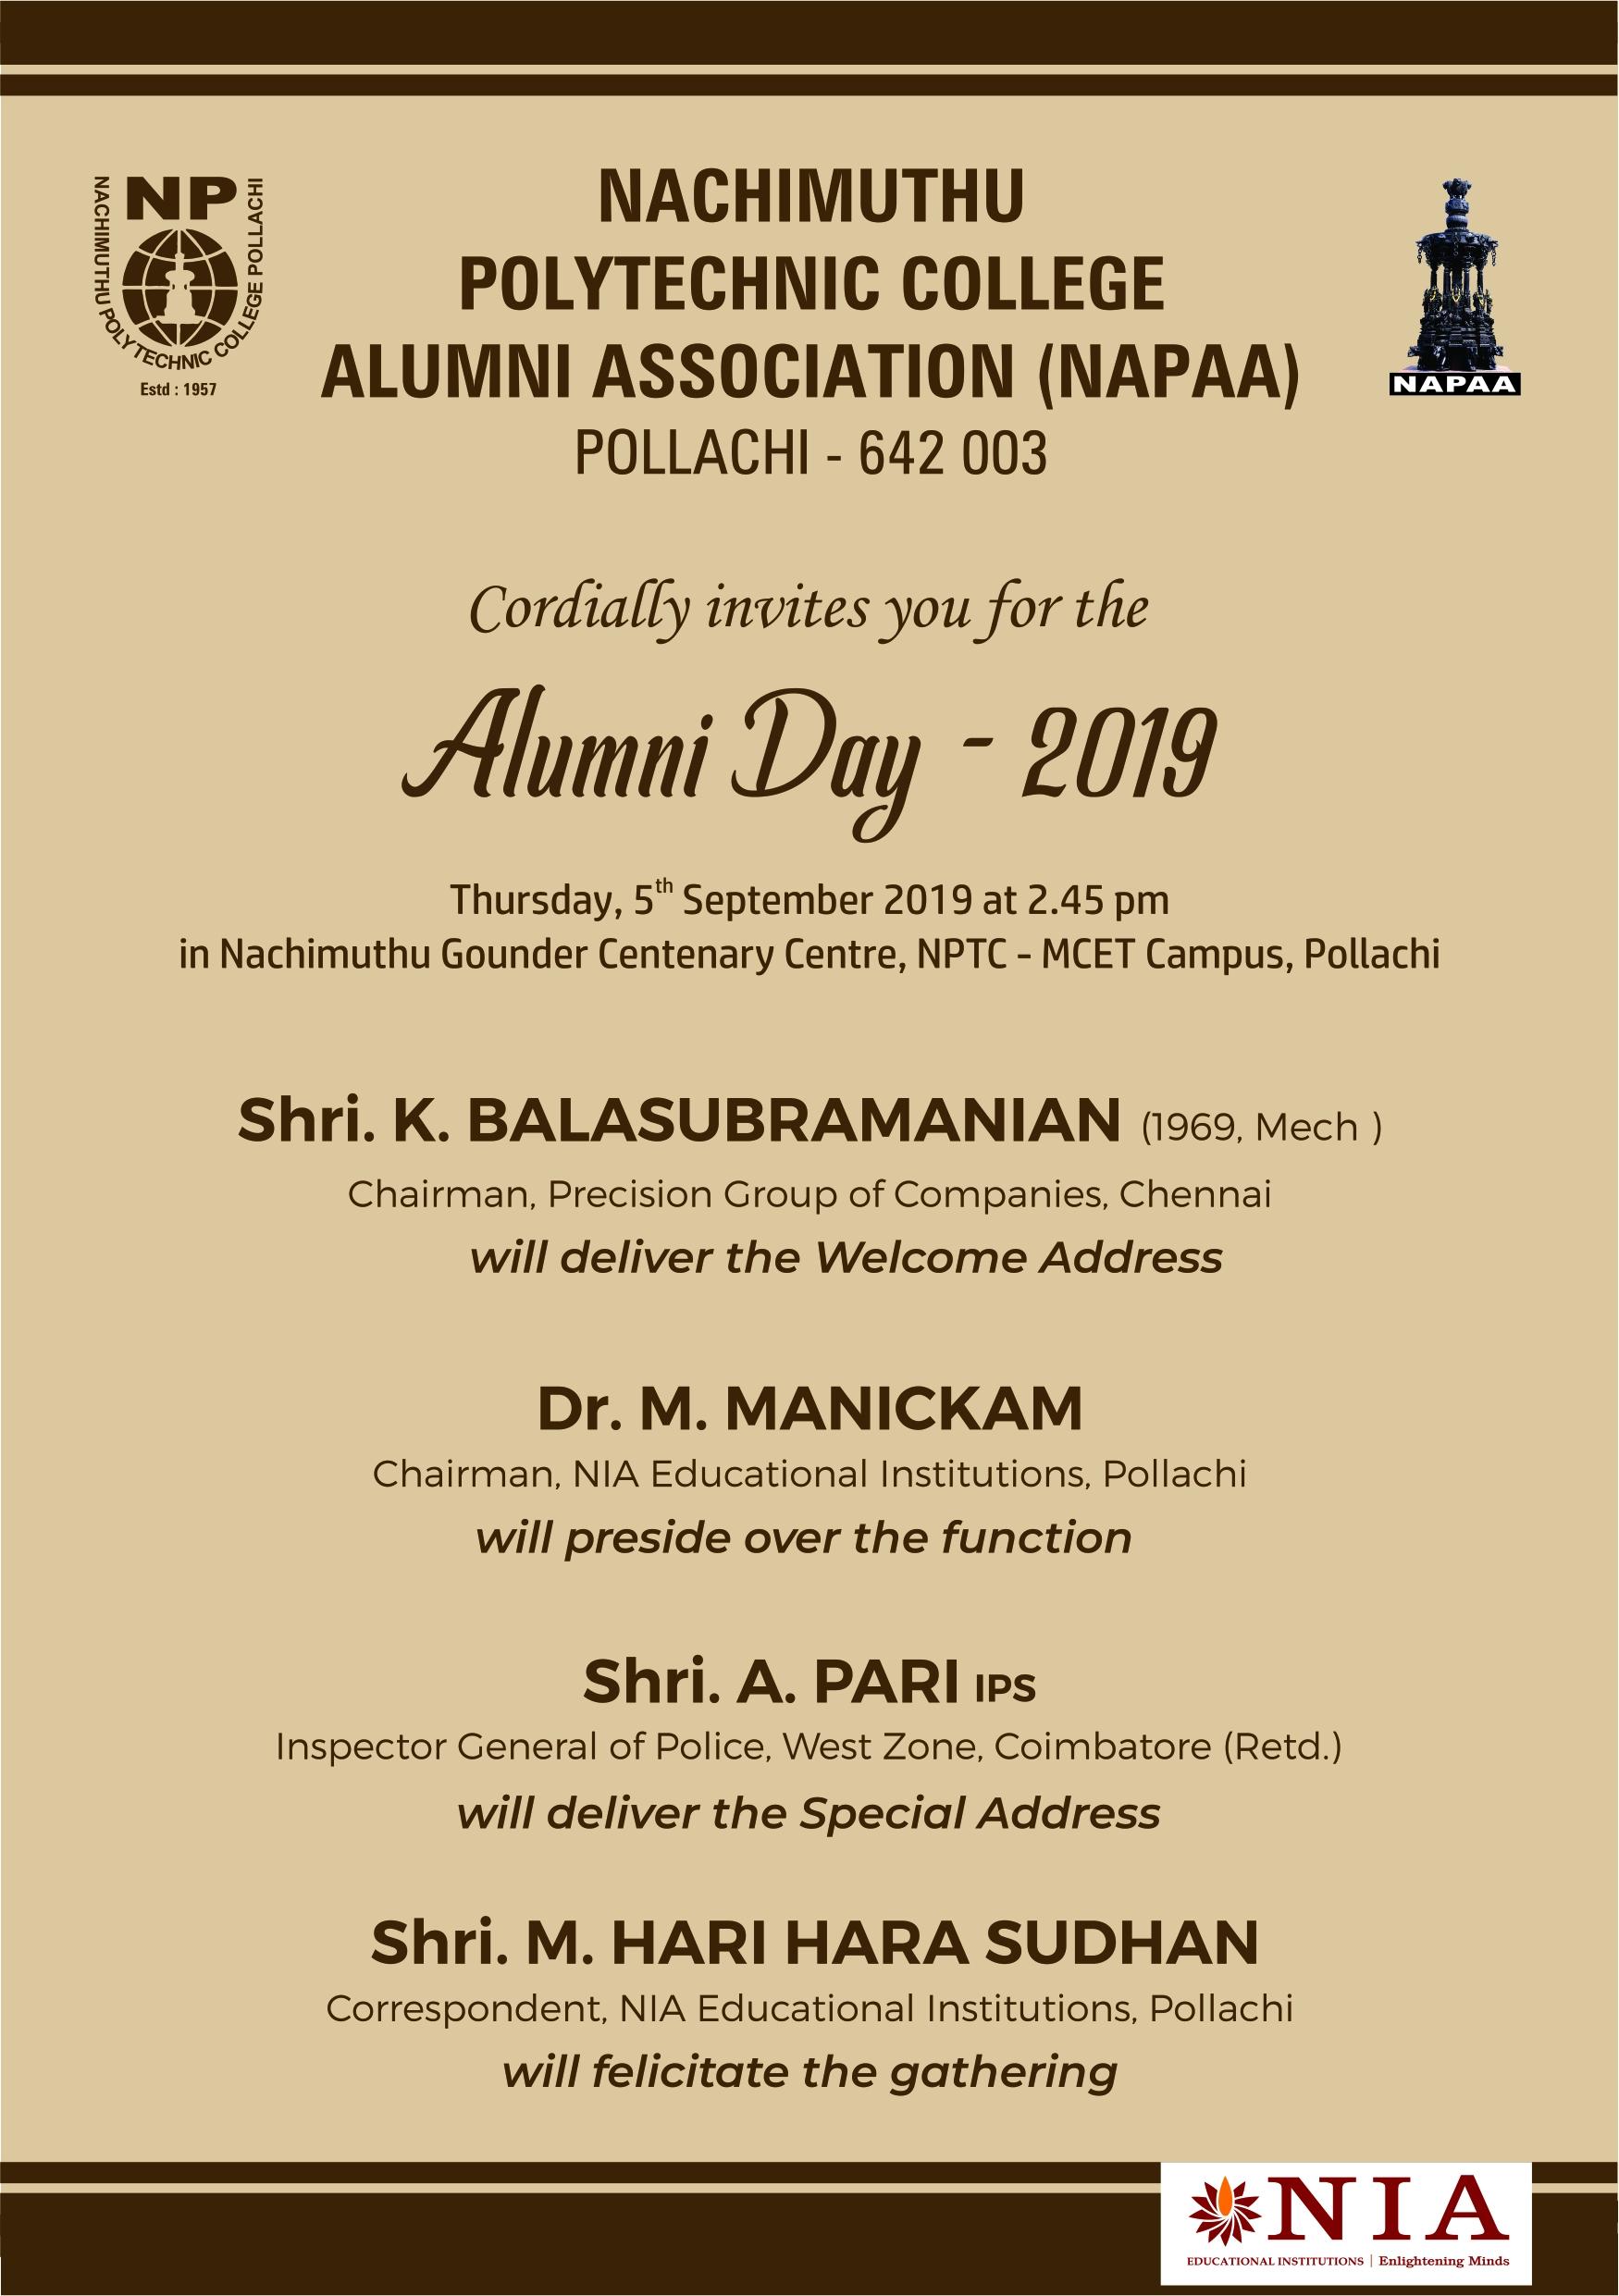 Alumni Day 2019